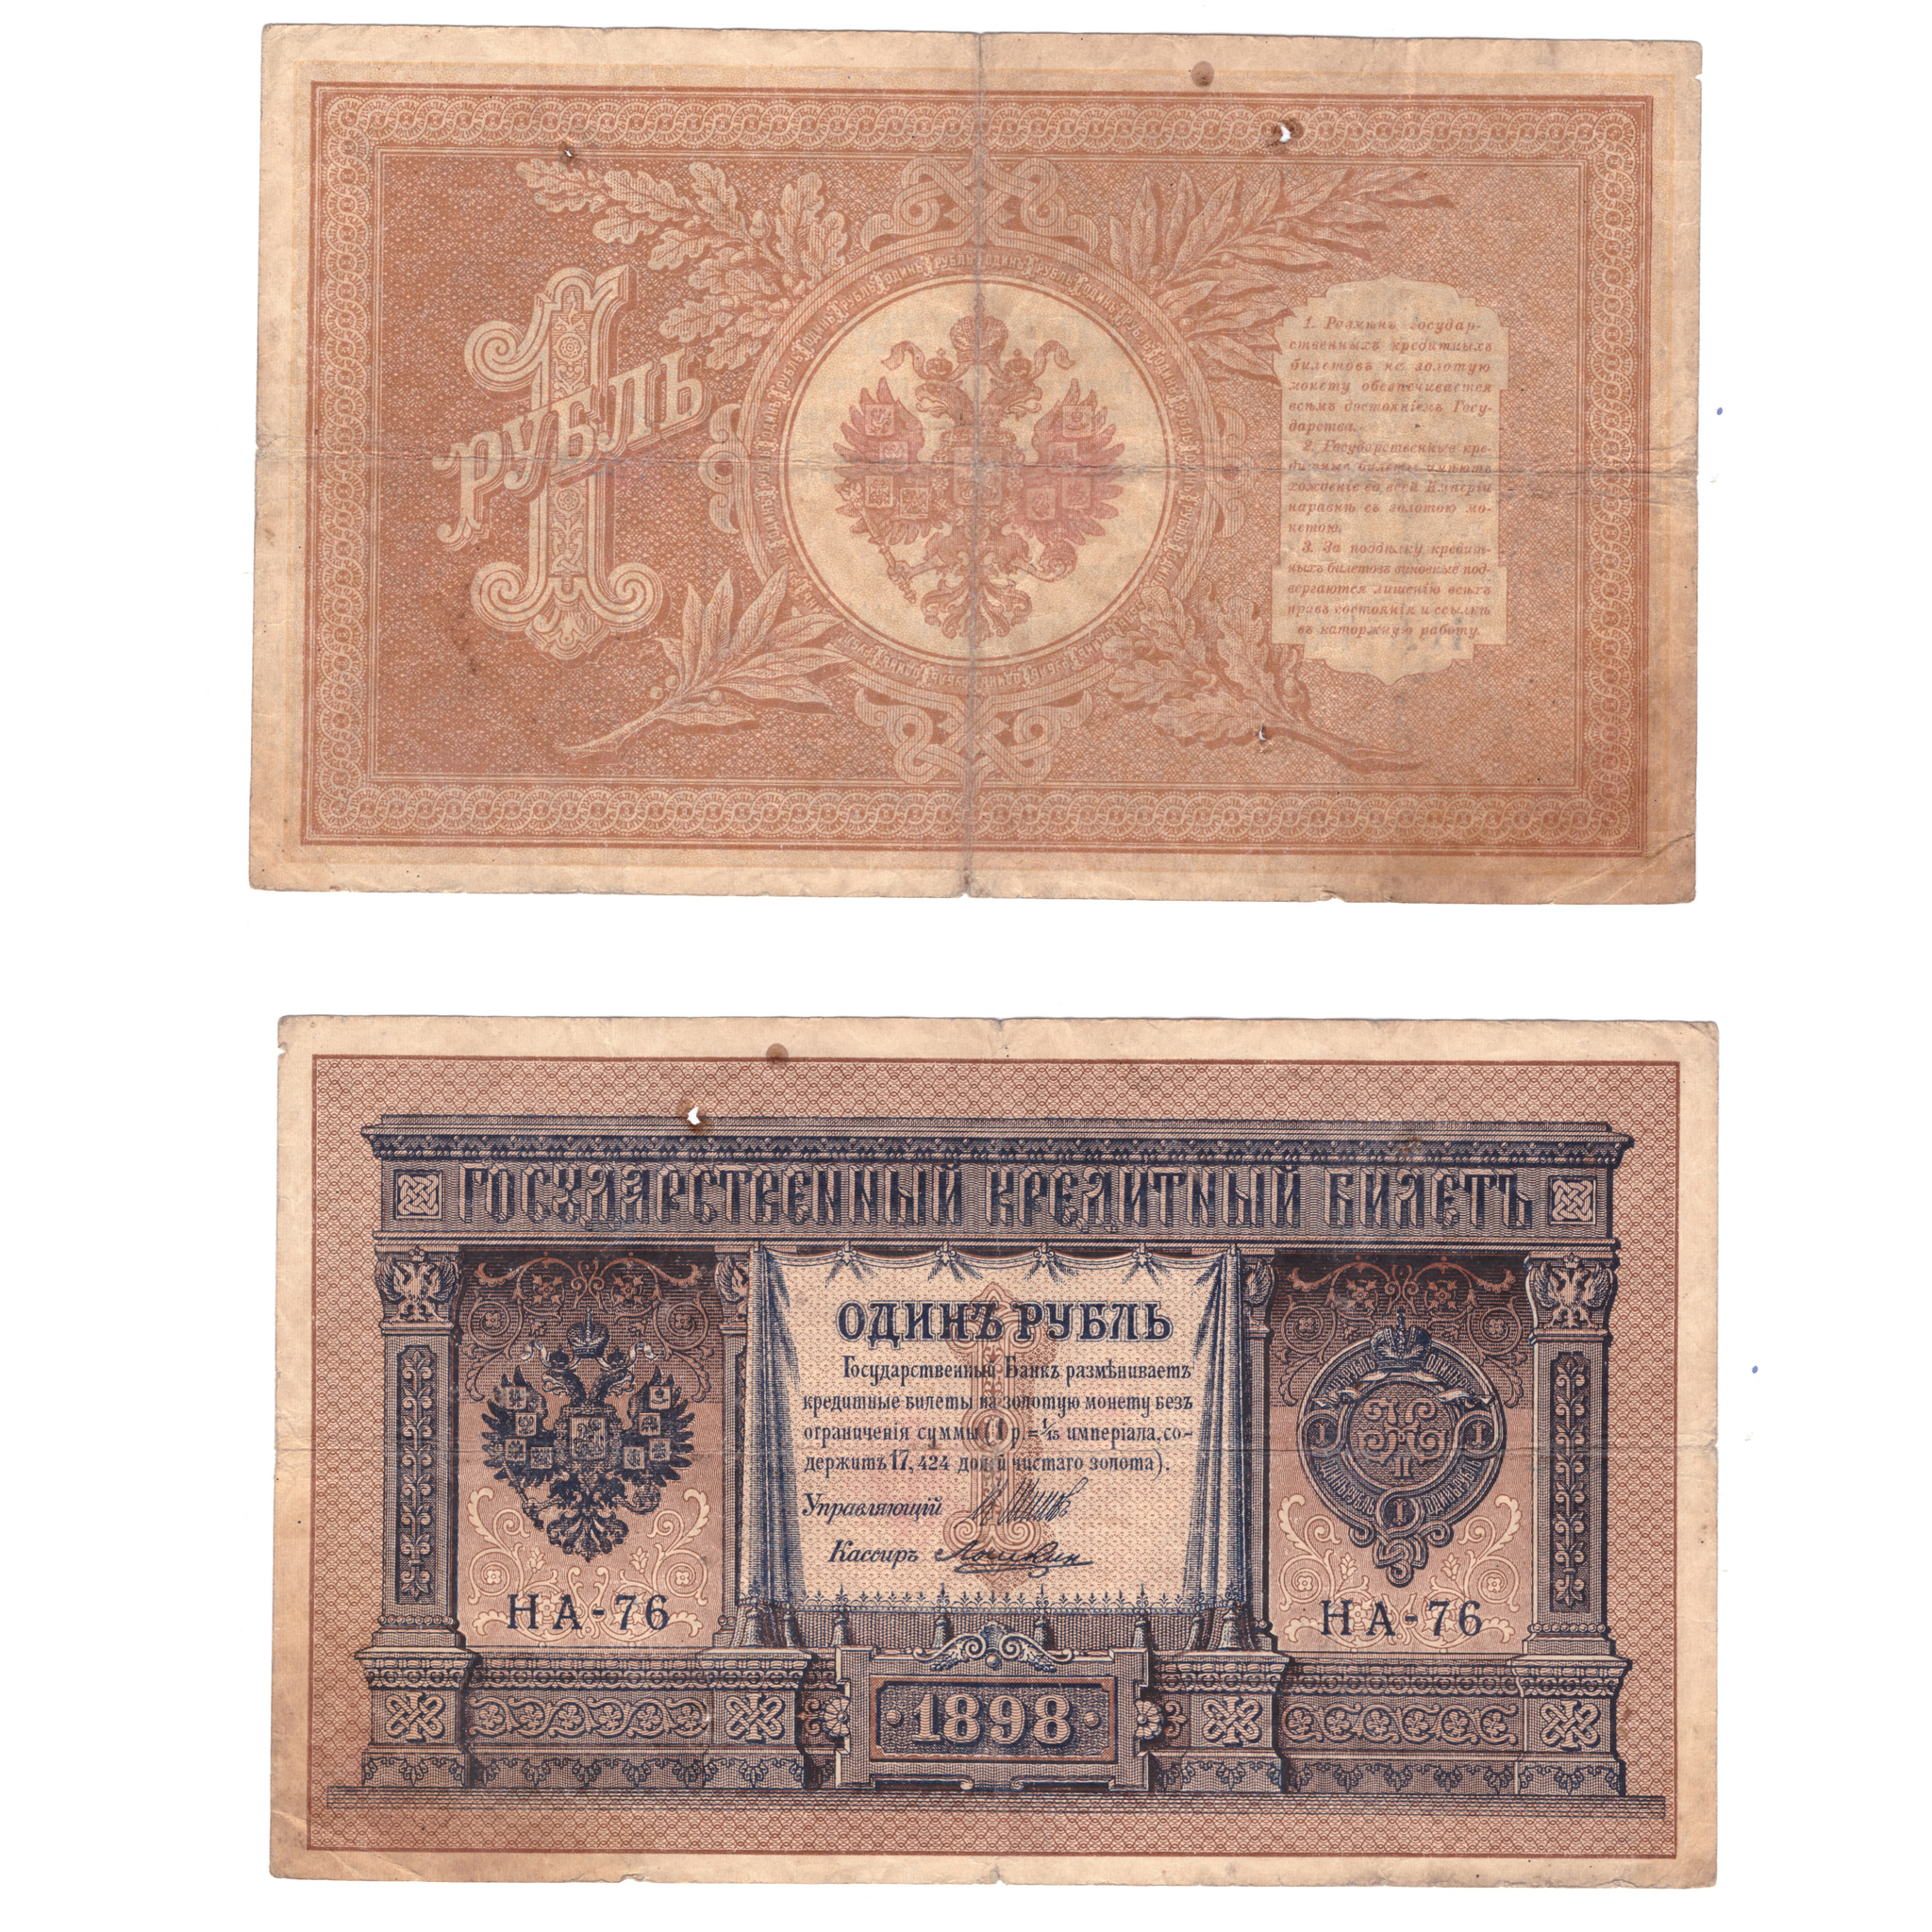 1 рубль 1898 г. Шипов Лошкин. НА-76. F-